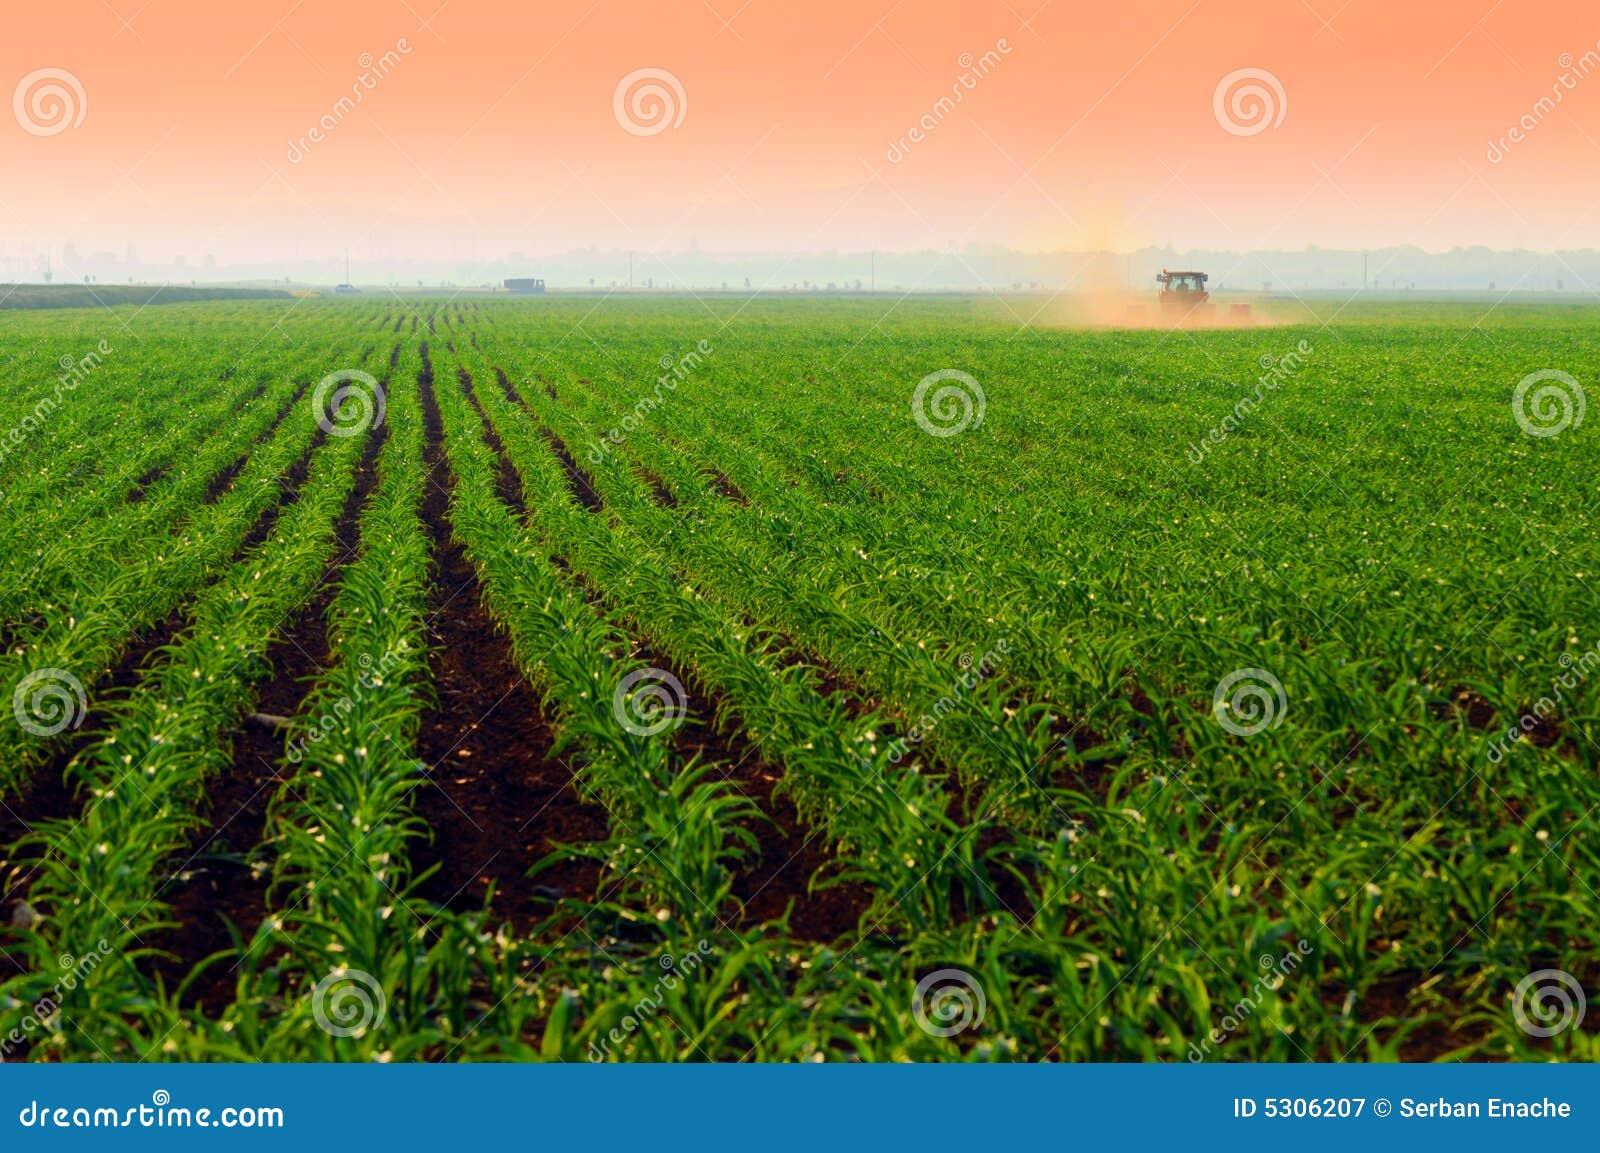 Corn fields at sunset